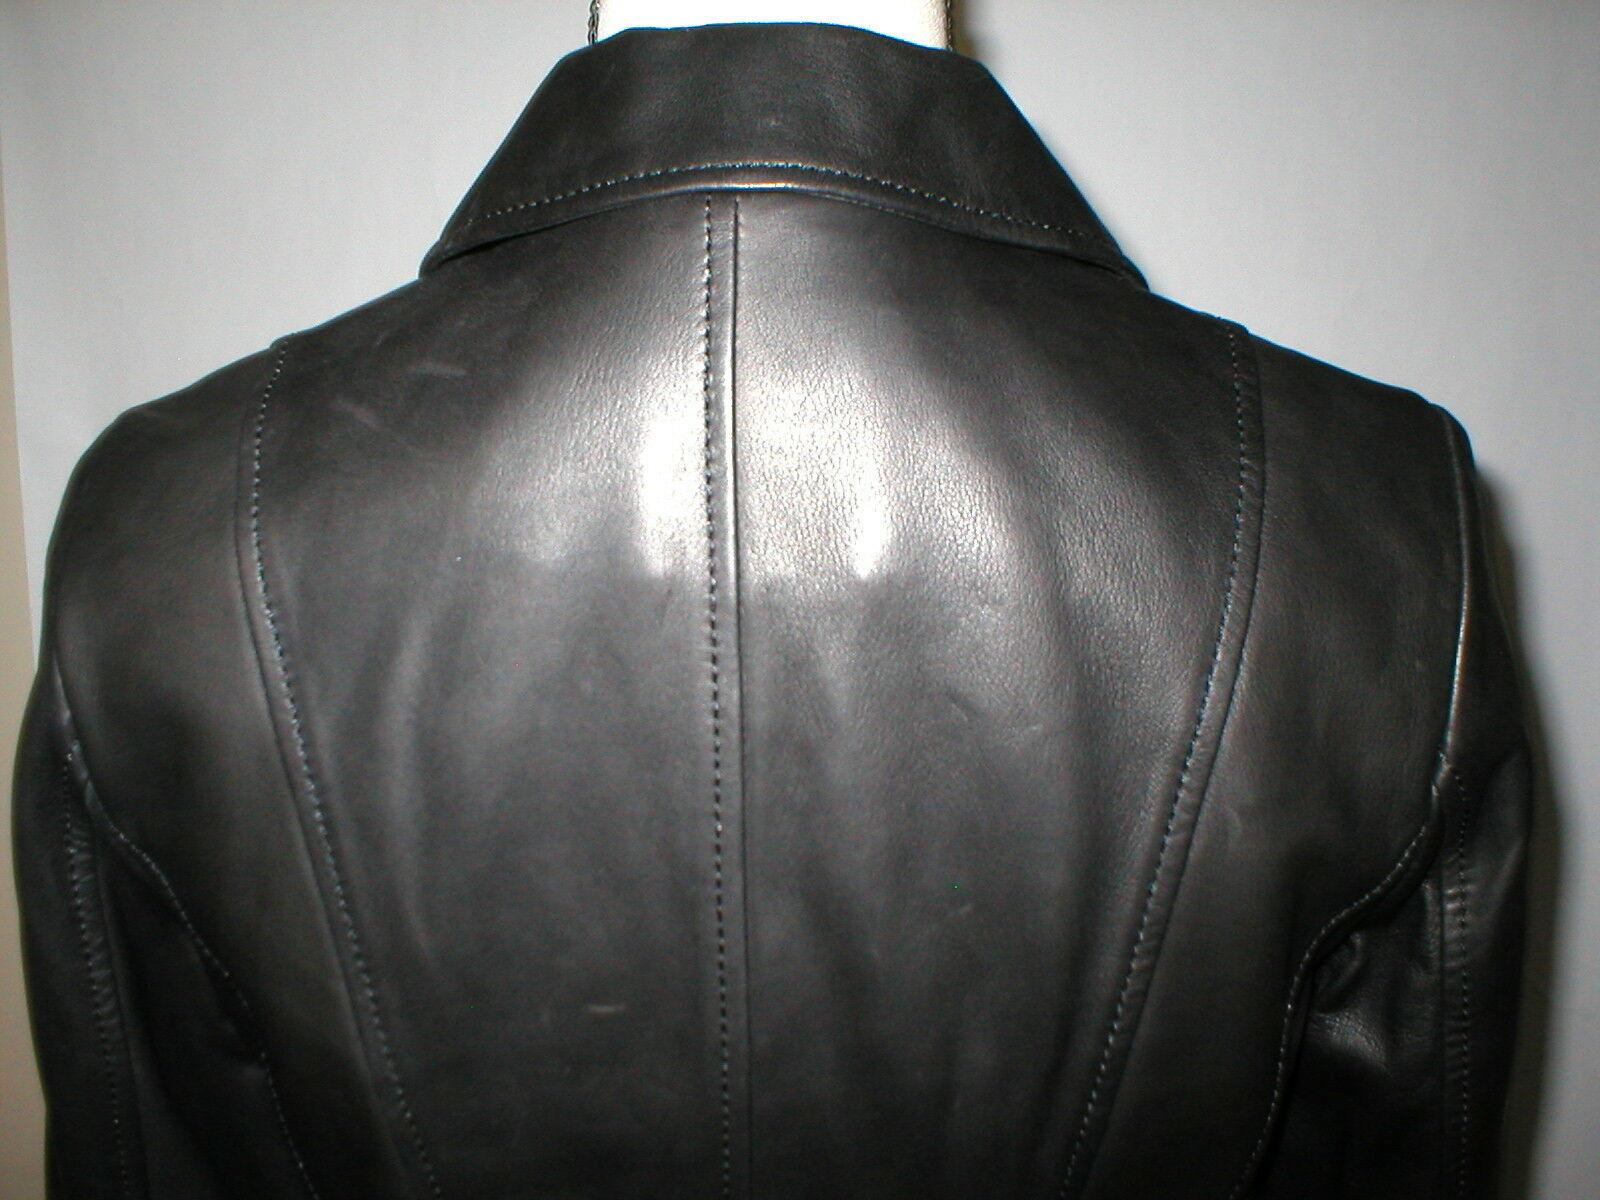 New Womens S Soft Karl Lagerfeld Paris Leather Jacket Black Silver Designer Lamb image 5